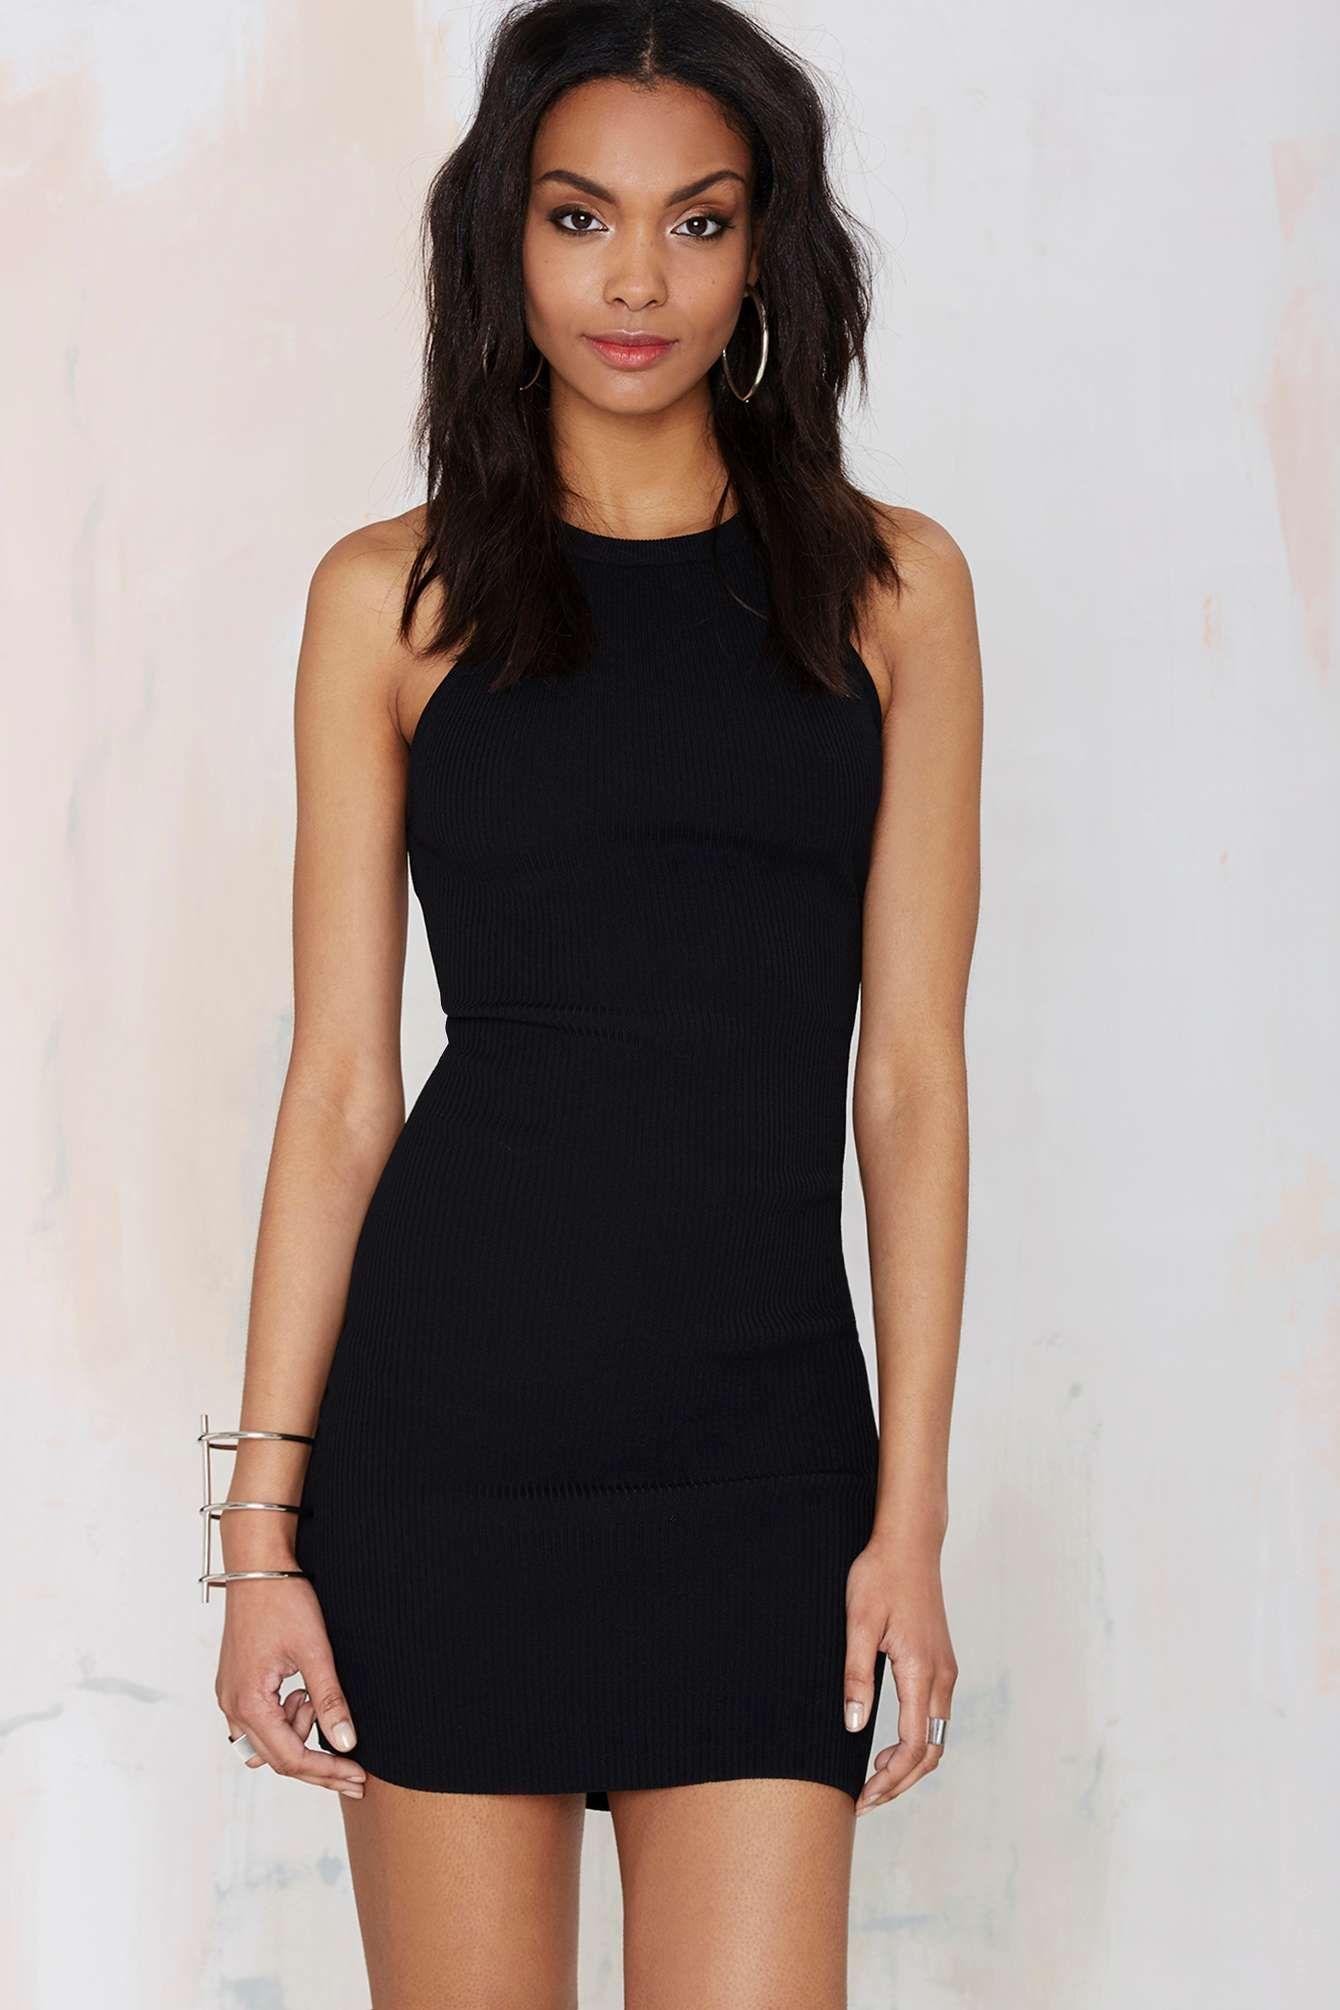 Nasty gal hold tight cutaway dress clothes pinterest womenus